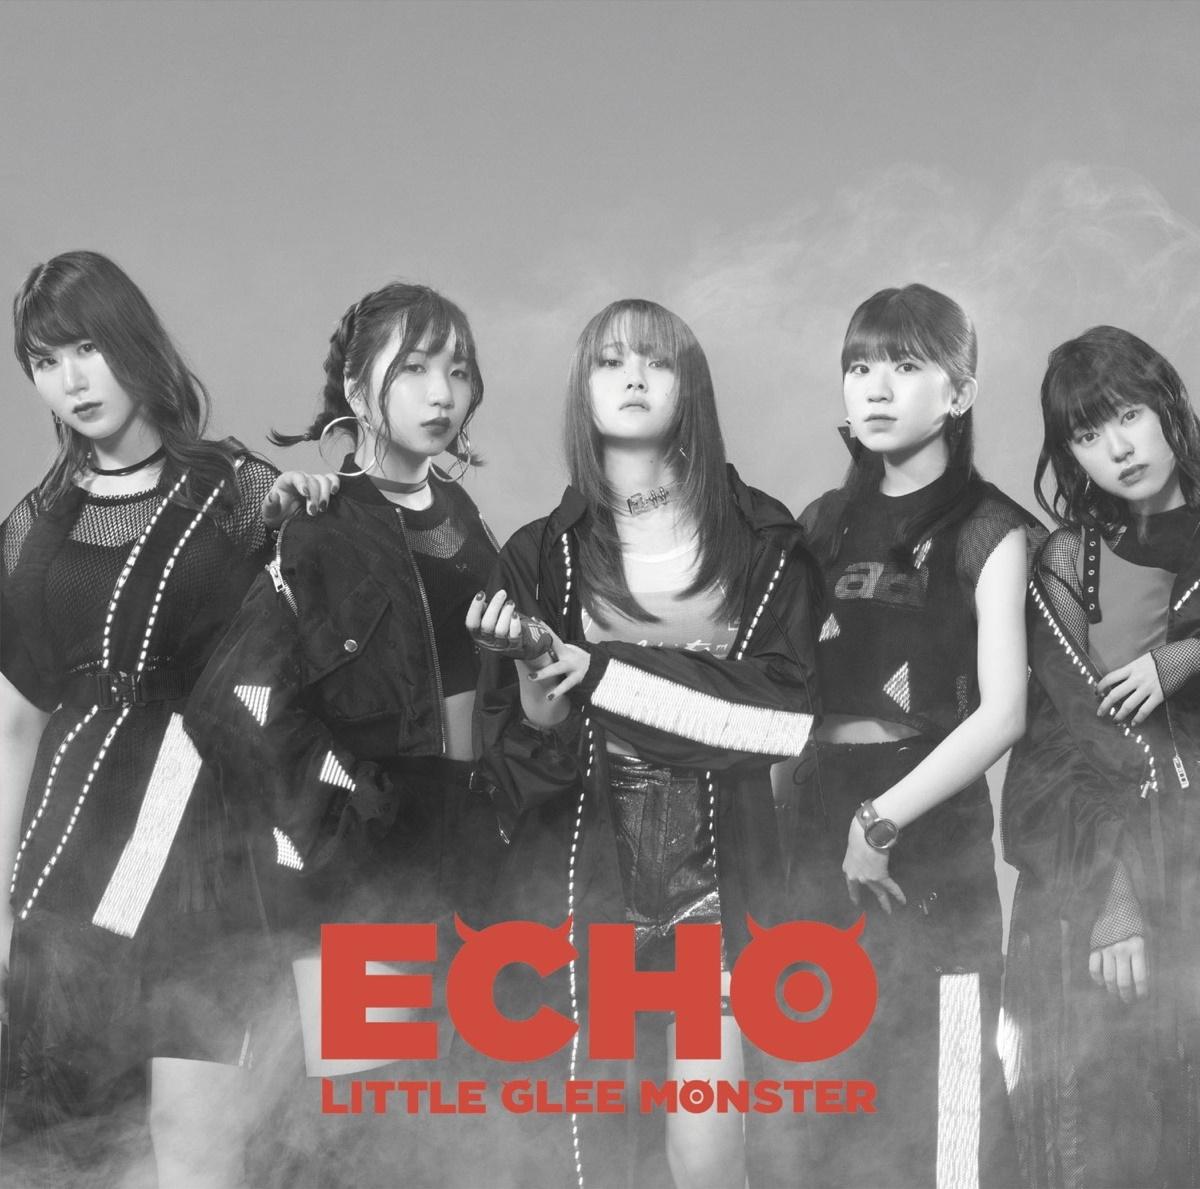 『Little Glee Monster - ECHO』収録の『ECHO』ジャケット